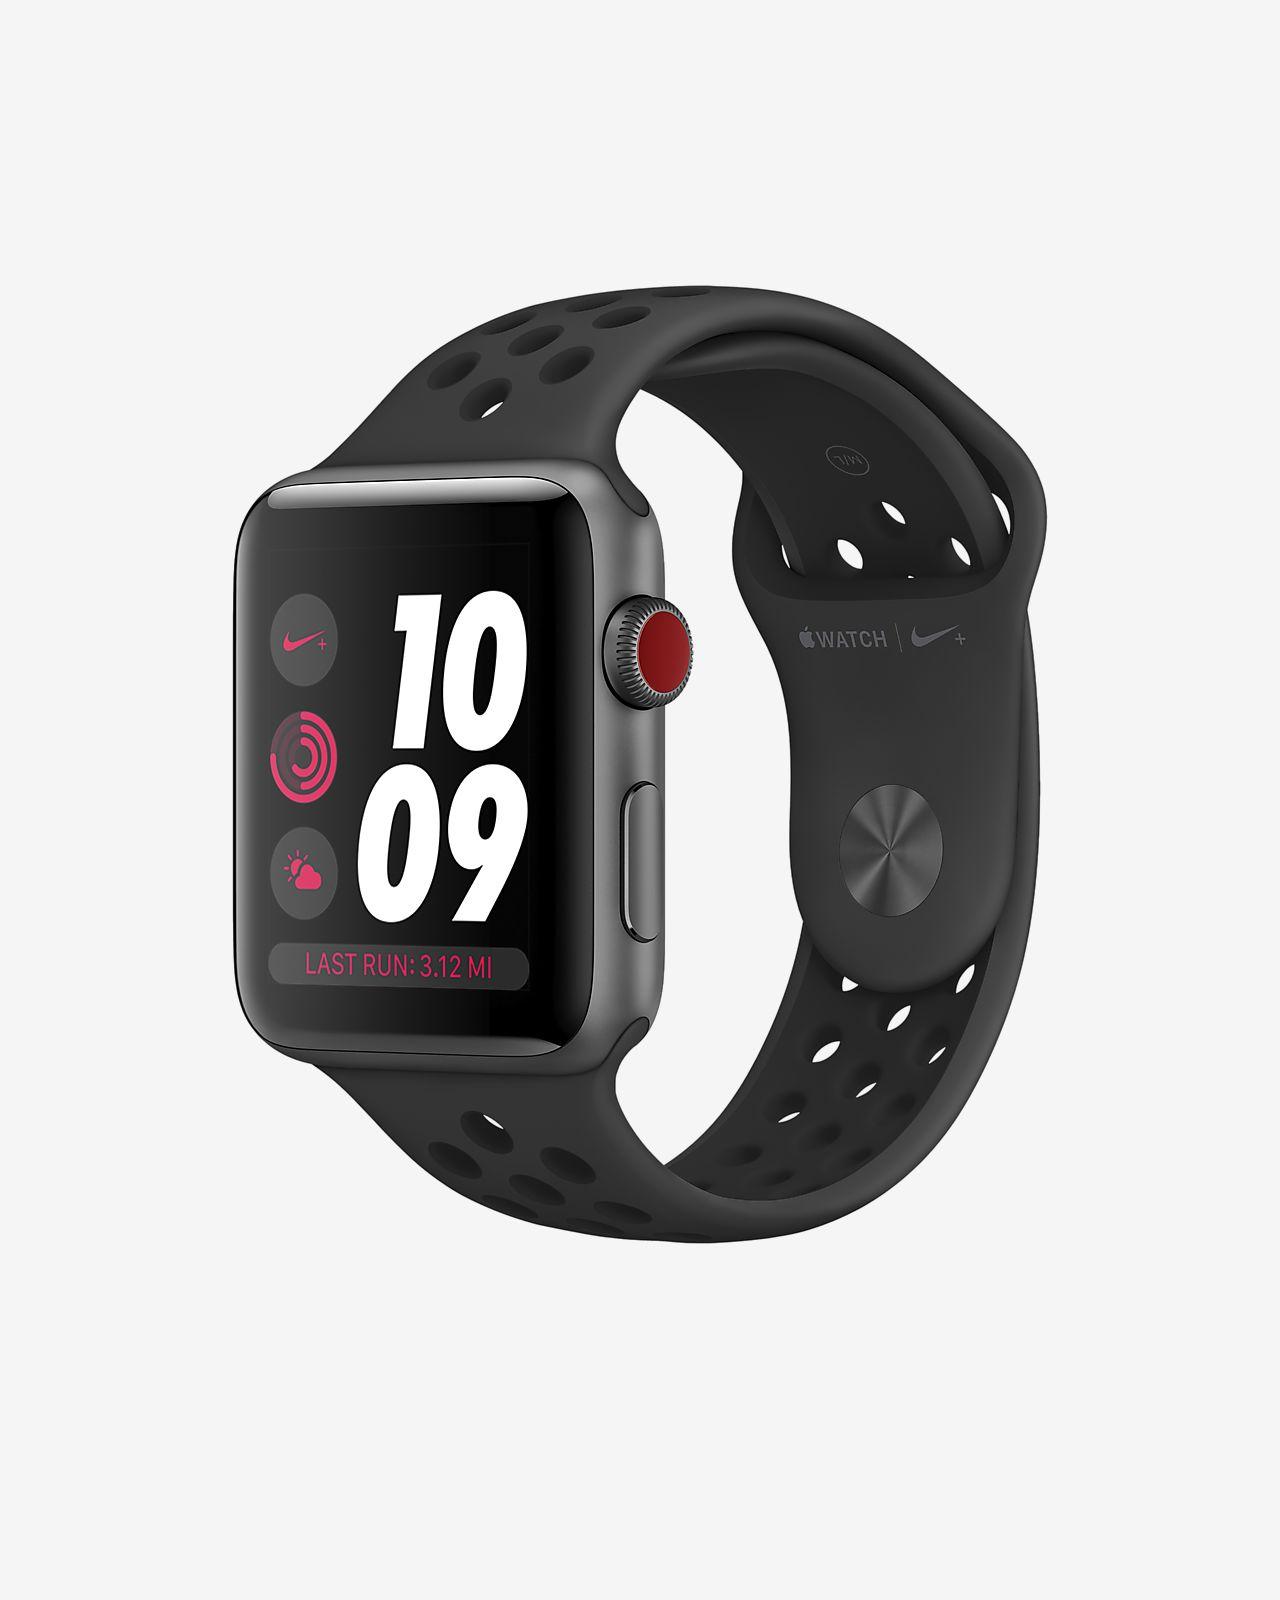 Apple Watch Nike Series 3 (GPS + Cellular) 42mm Running Watch